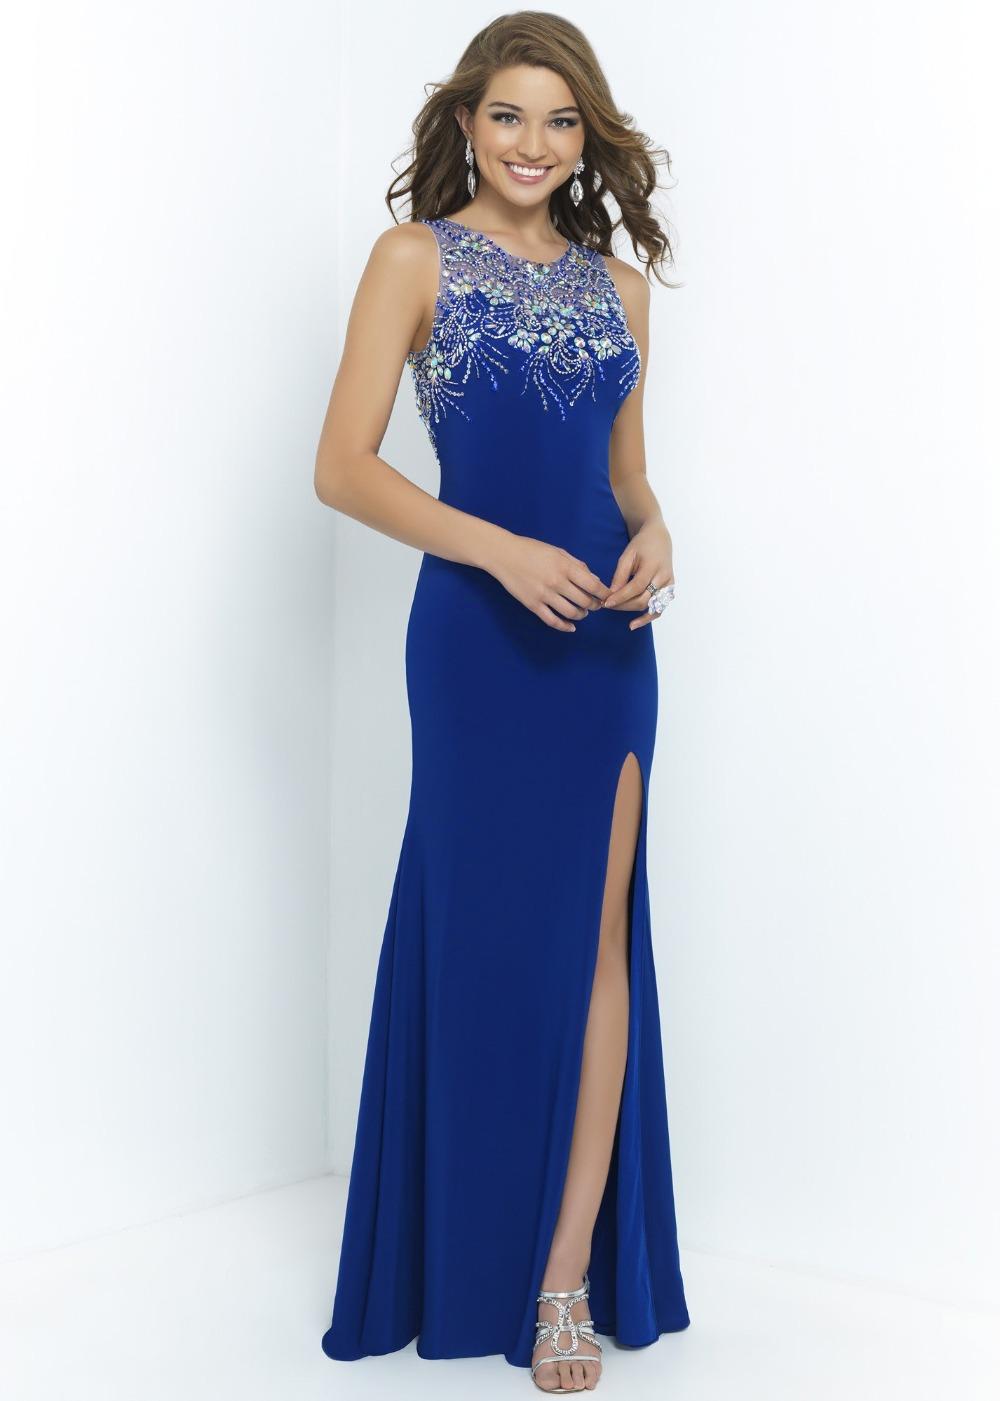 b7a4a68057 Get Quotations · Shiny Crystals Rhinestones Beaded Blue Pearl Pink Side  Silt Long Prom Evening Dress Vestido De Festa